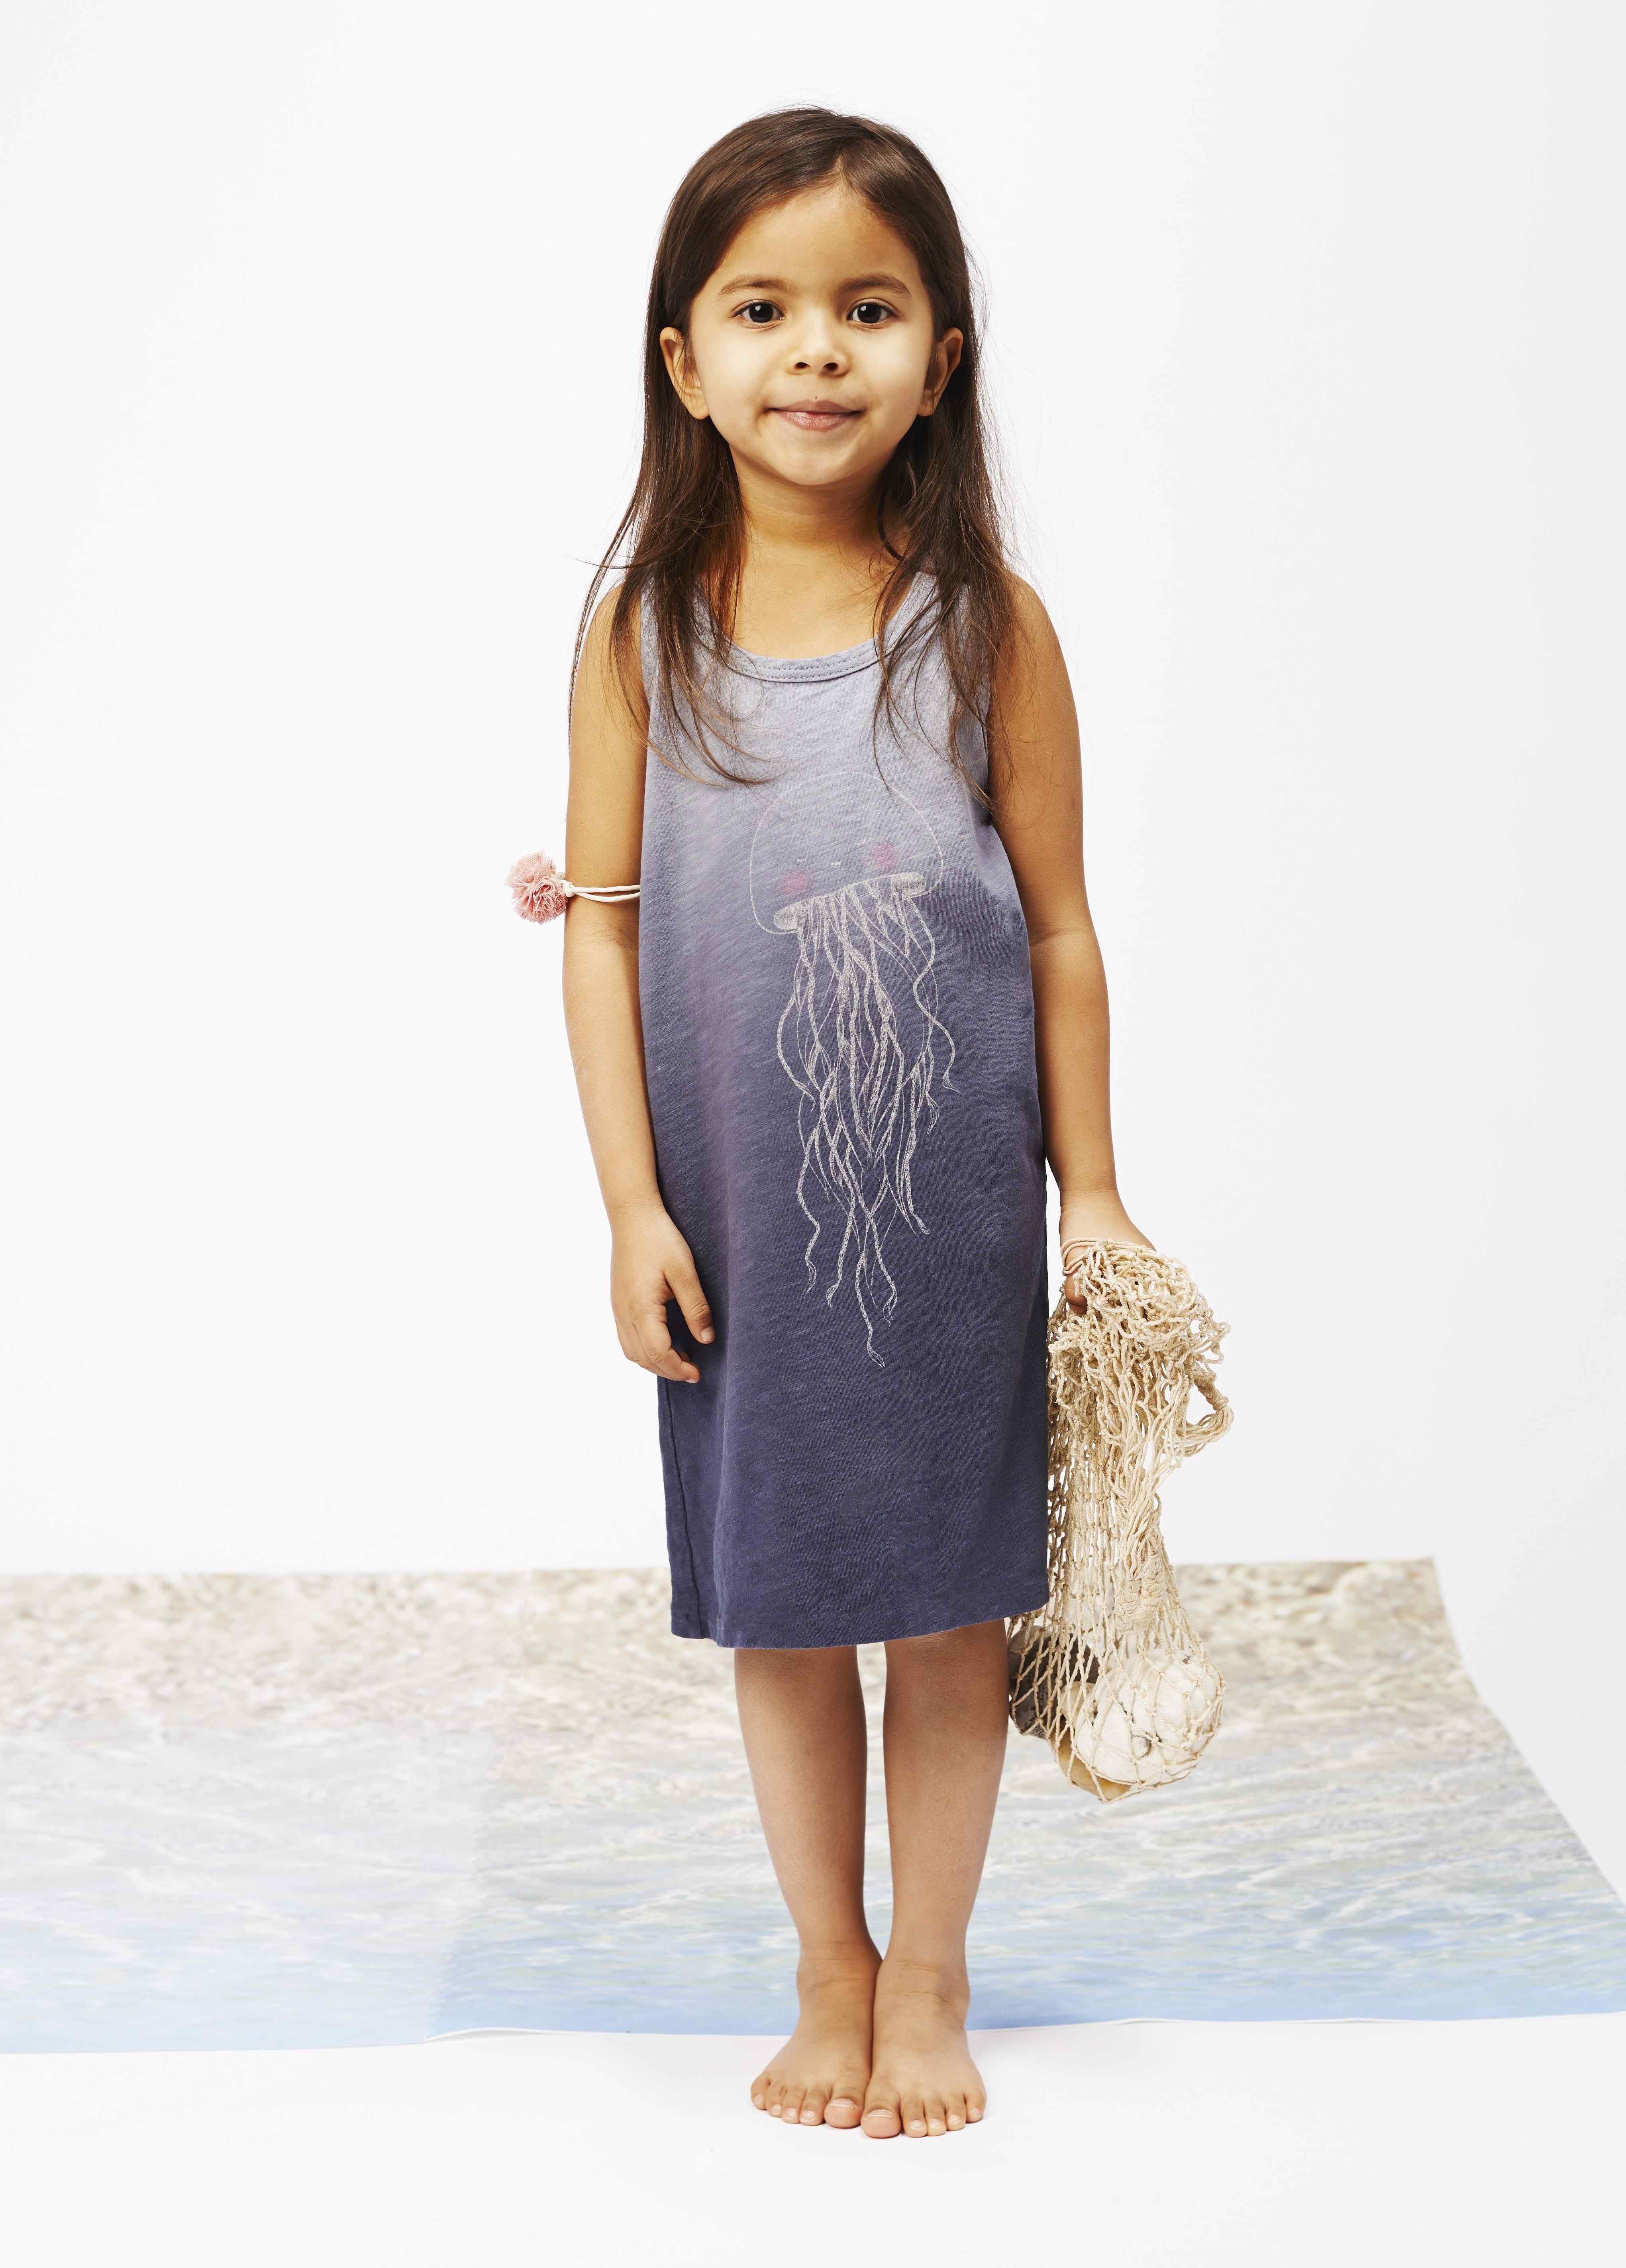 kidsonthemoon-moonjelly-dress-01